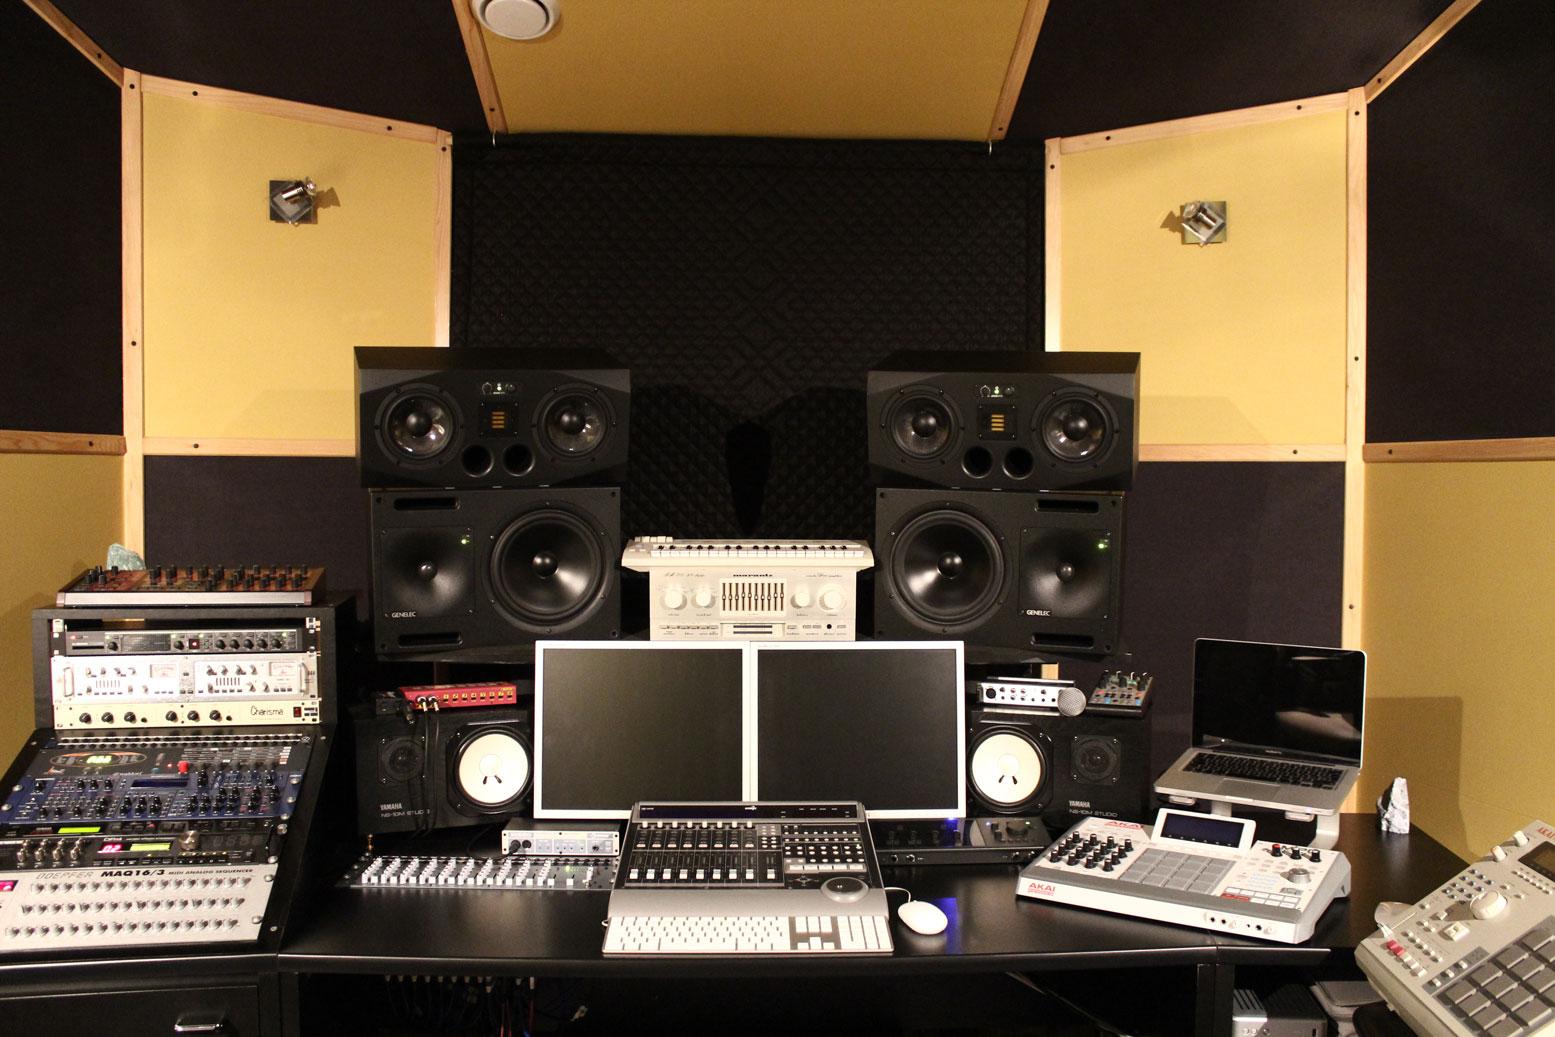 About Annunaki - Annunaki Records